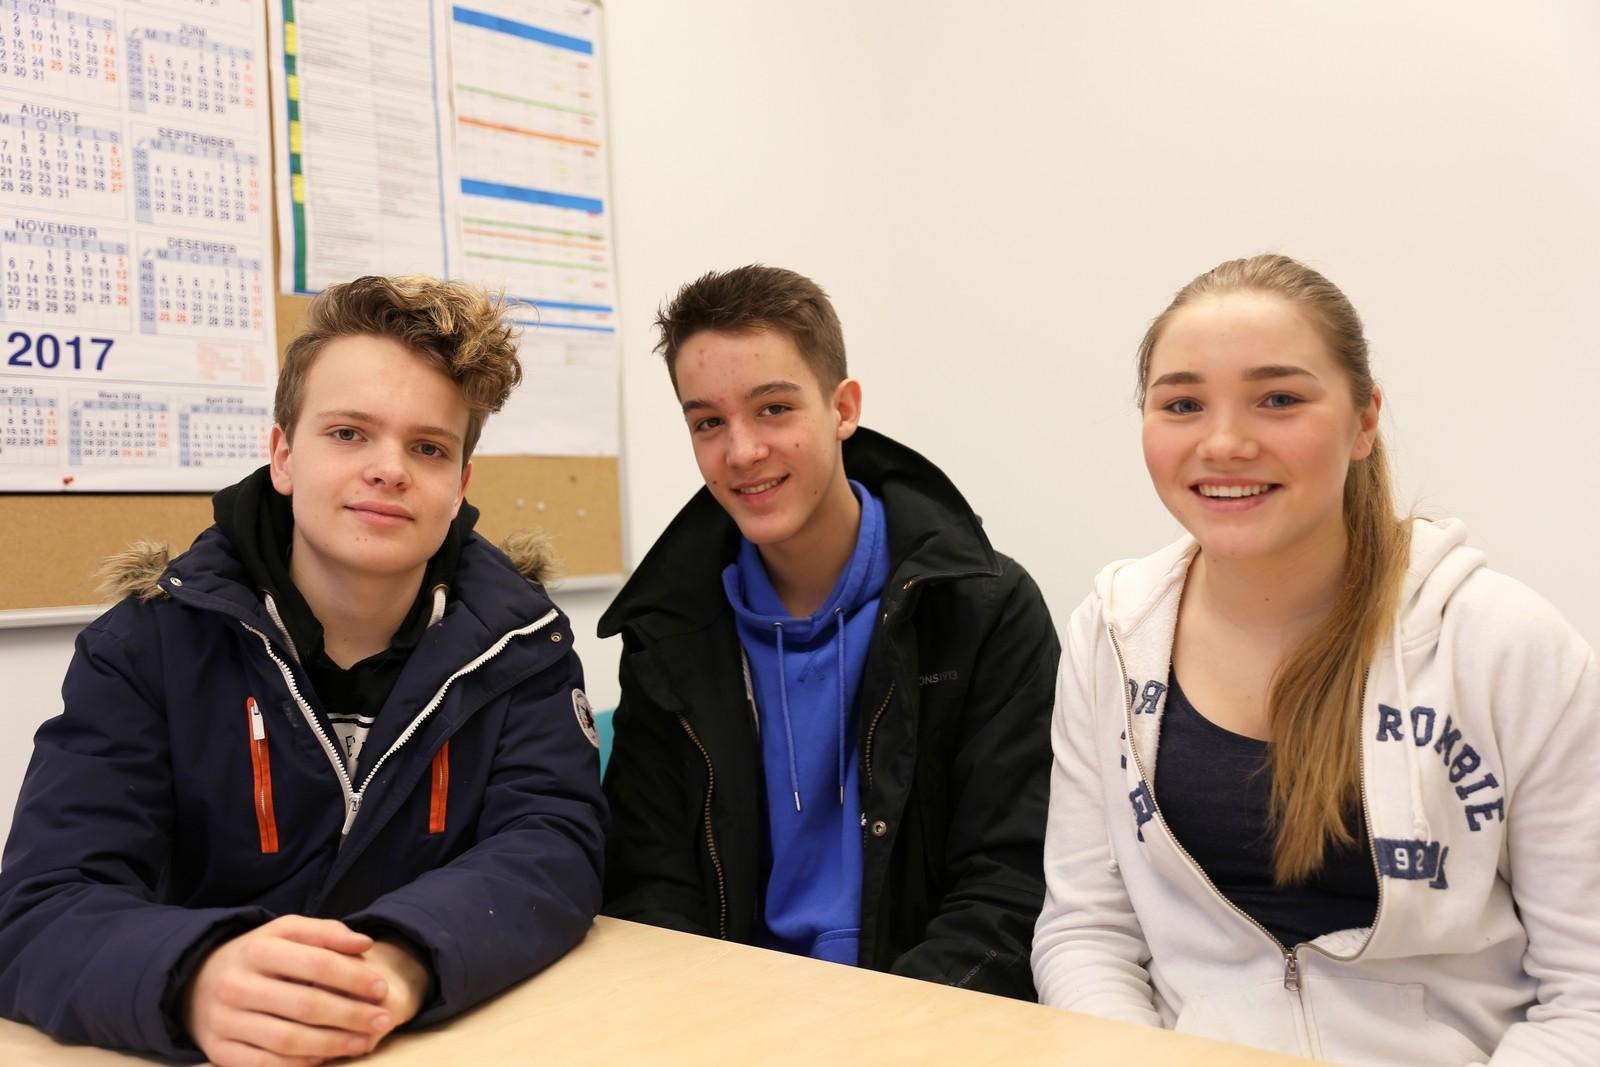 7 POENG: Fra Kvam ungdomsskule deltok Samuel Lyngset, Elias Selvik Undal (i midten) og Hanna Børve.